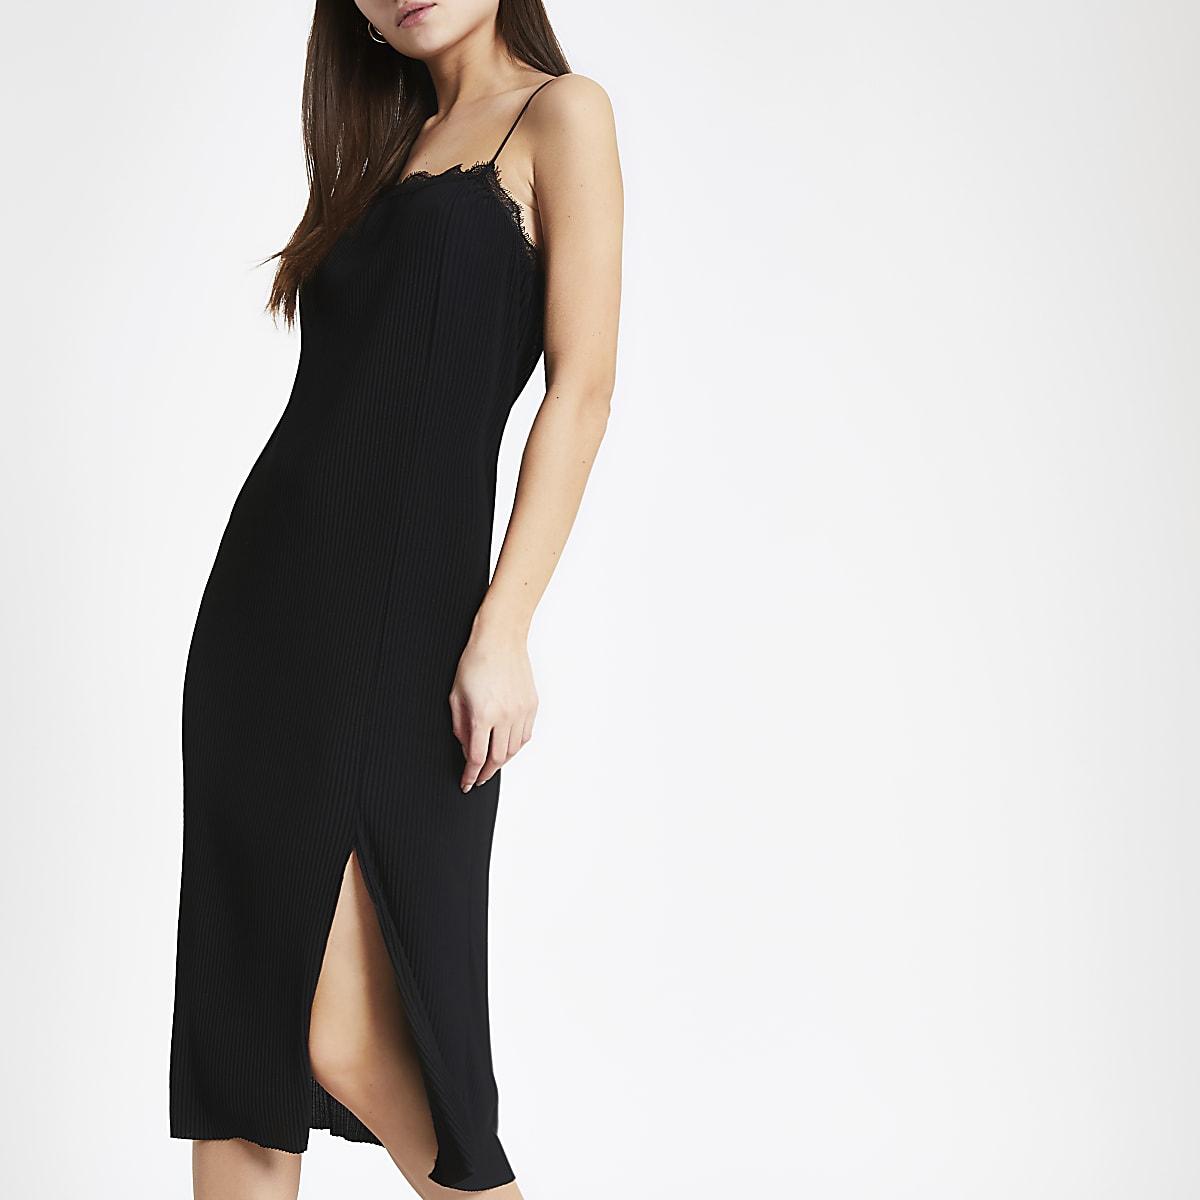 Black lace cami midi dress